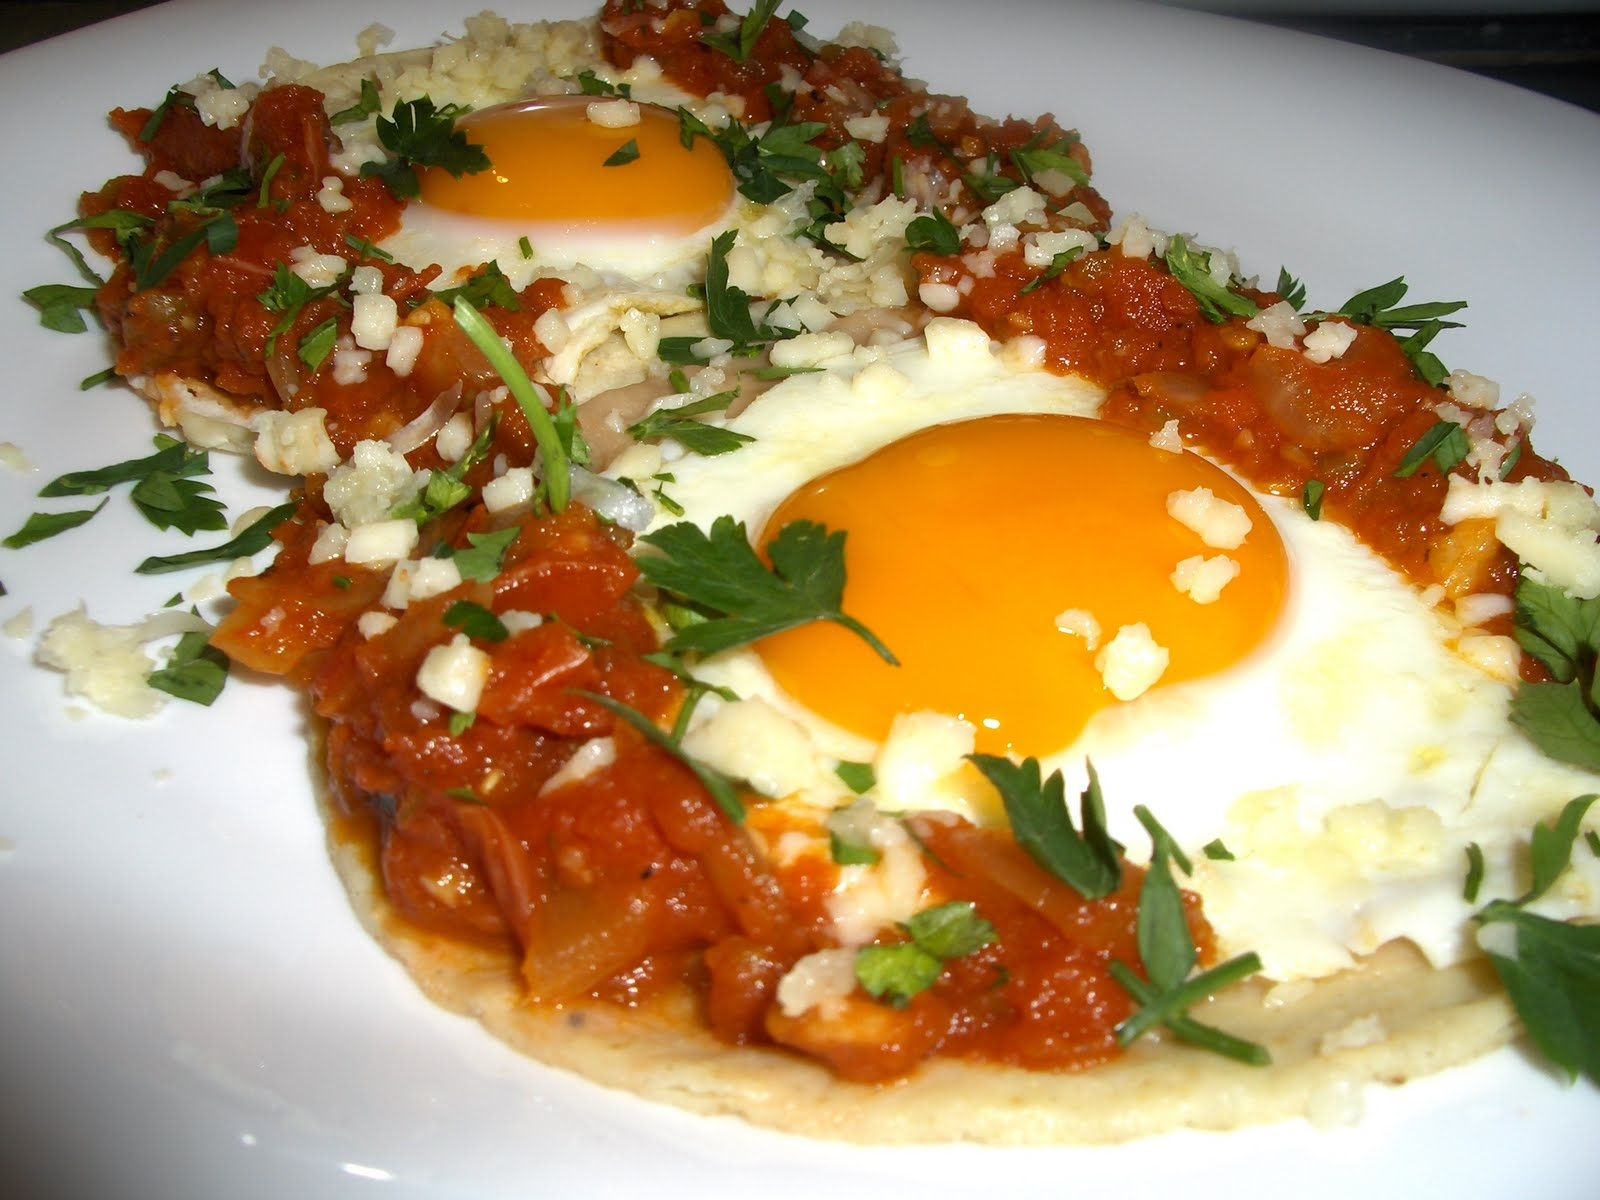 Huevos Rancheros, colazione californiana o messicana ...